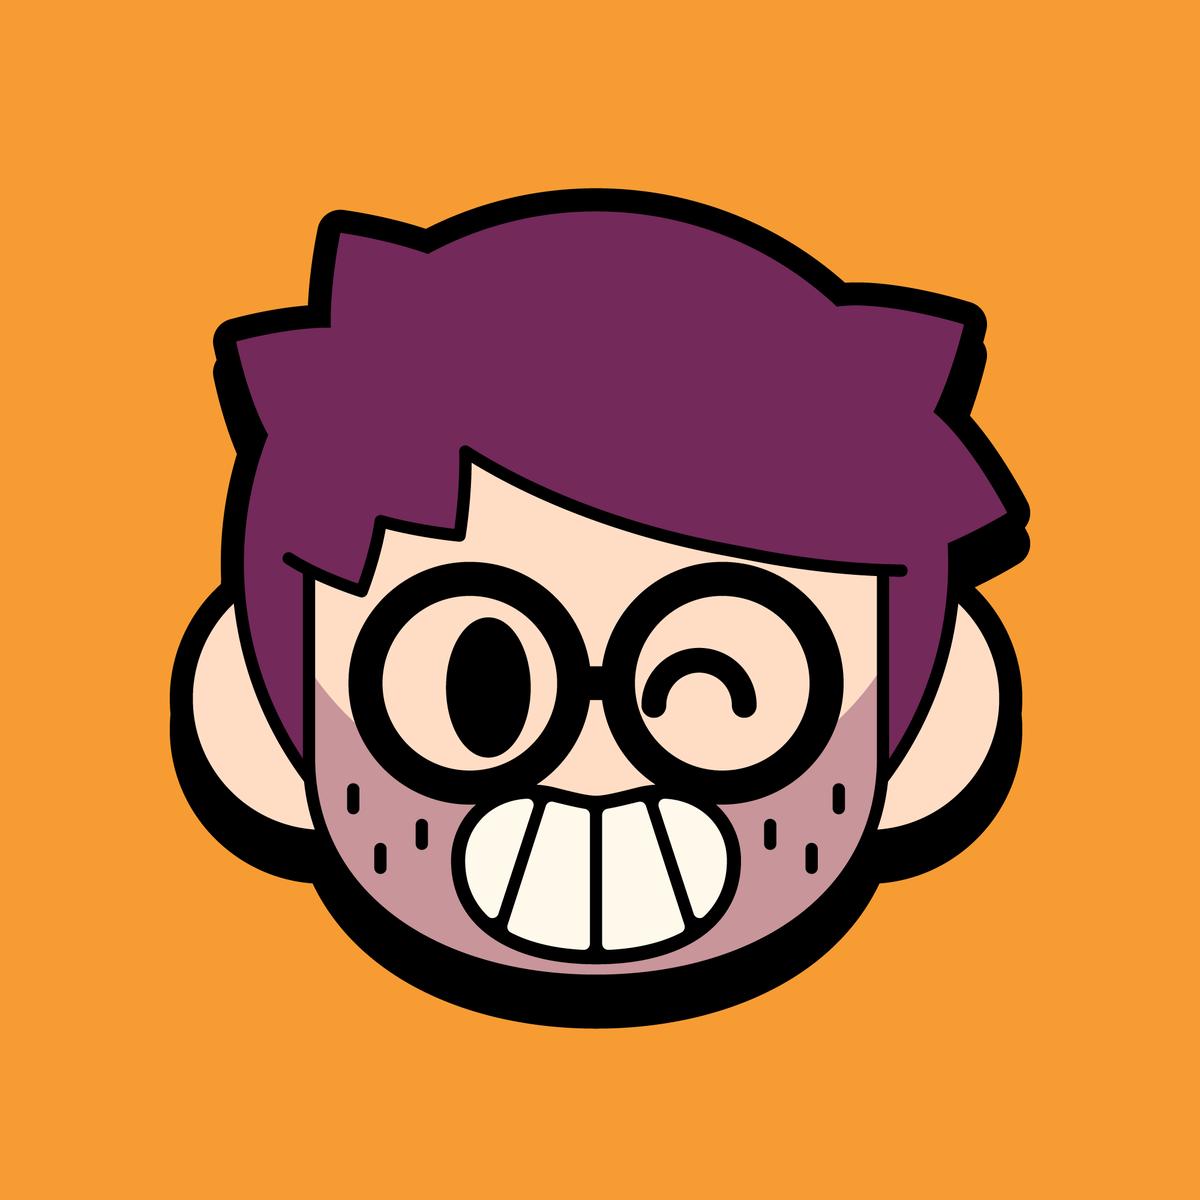 New profile pic.. who dis?  #avatar #vector #illustrator #vectorart #portraits<br>http://pic.twitter.com/Z60PFHw7hK